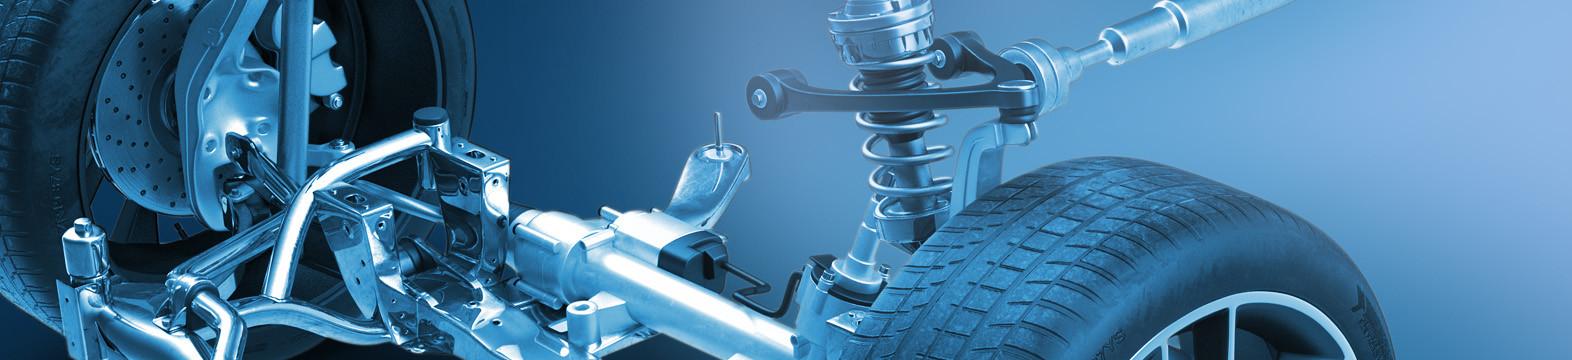 header-chassis.jpg